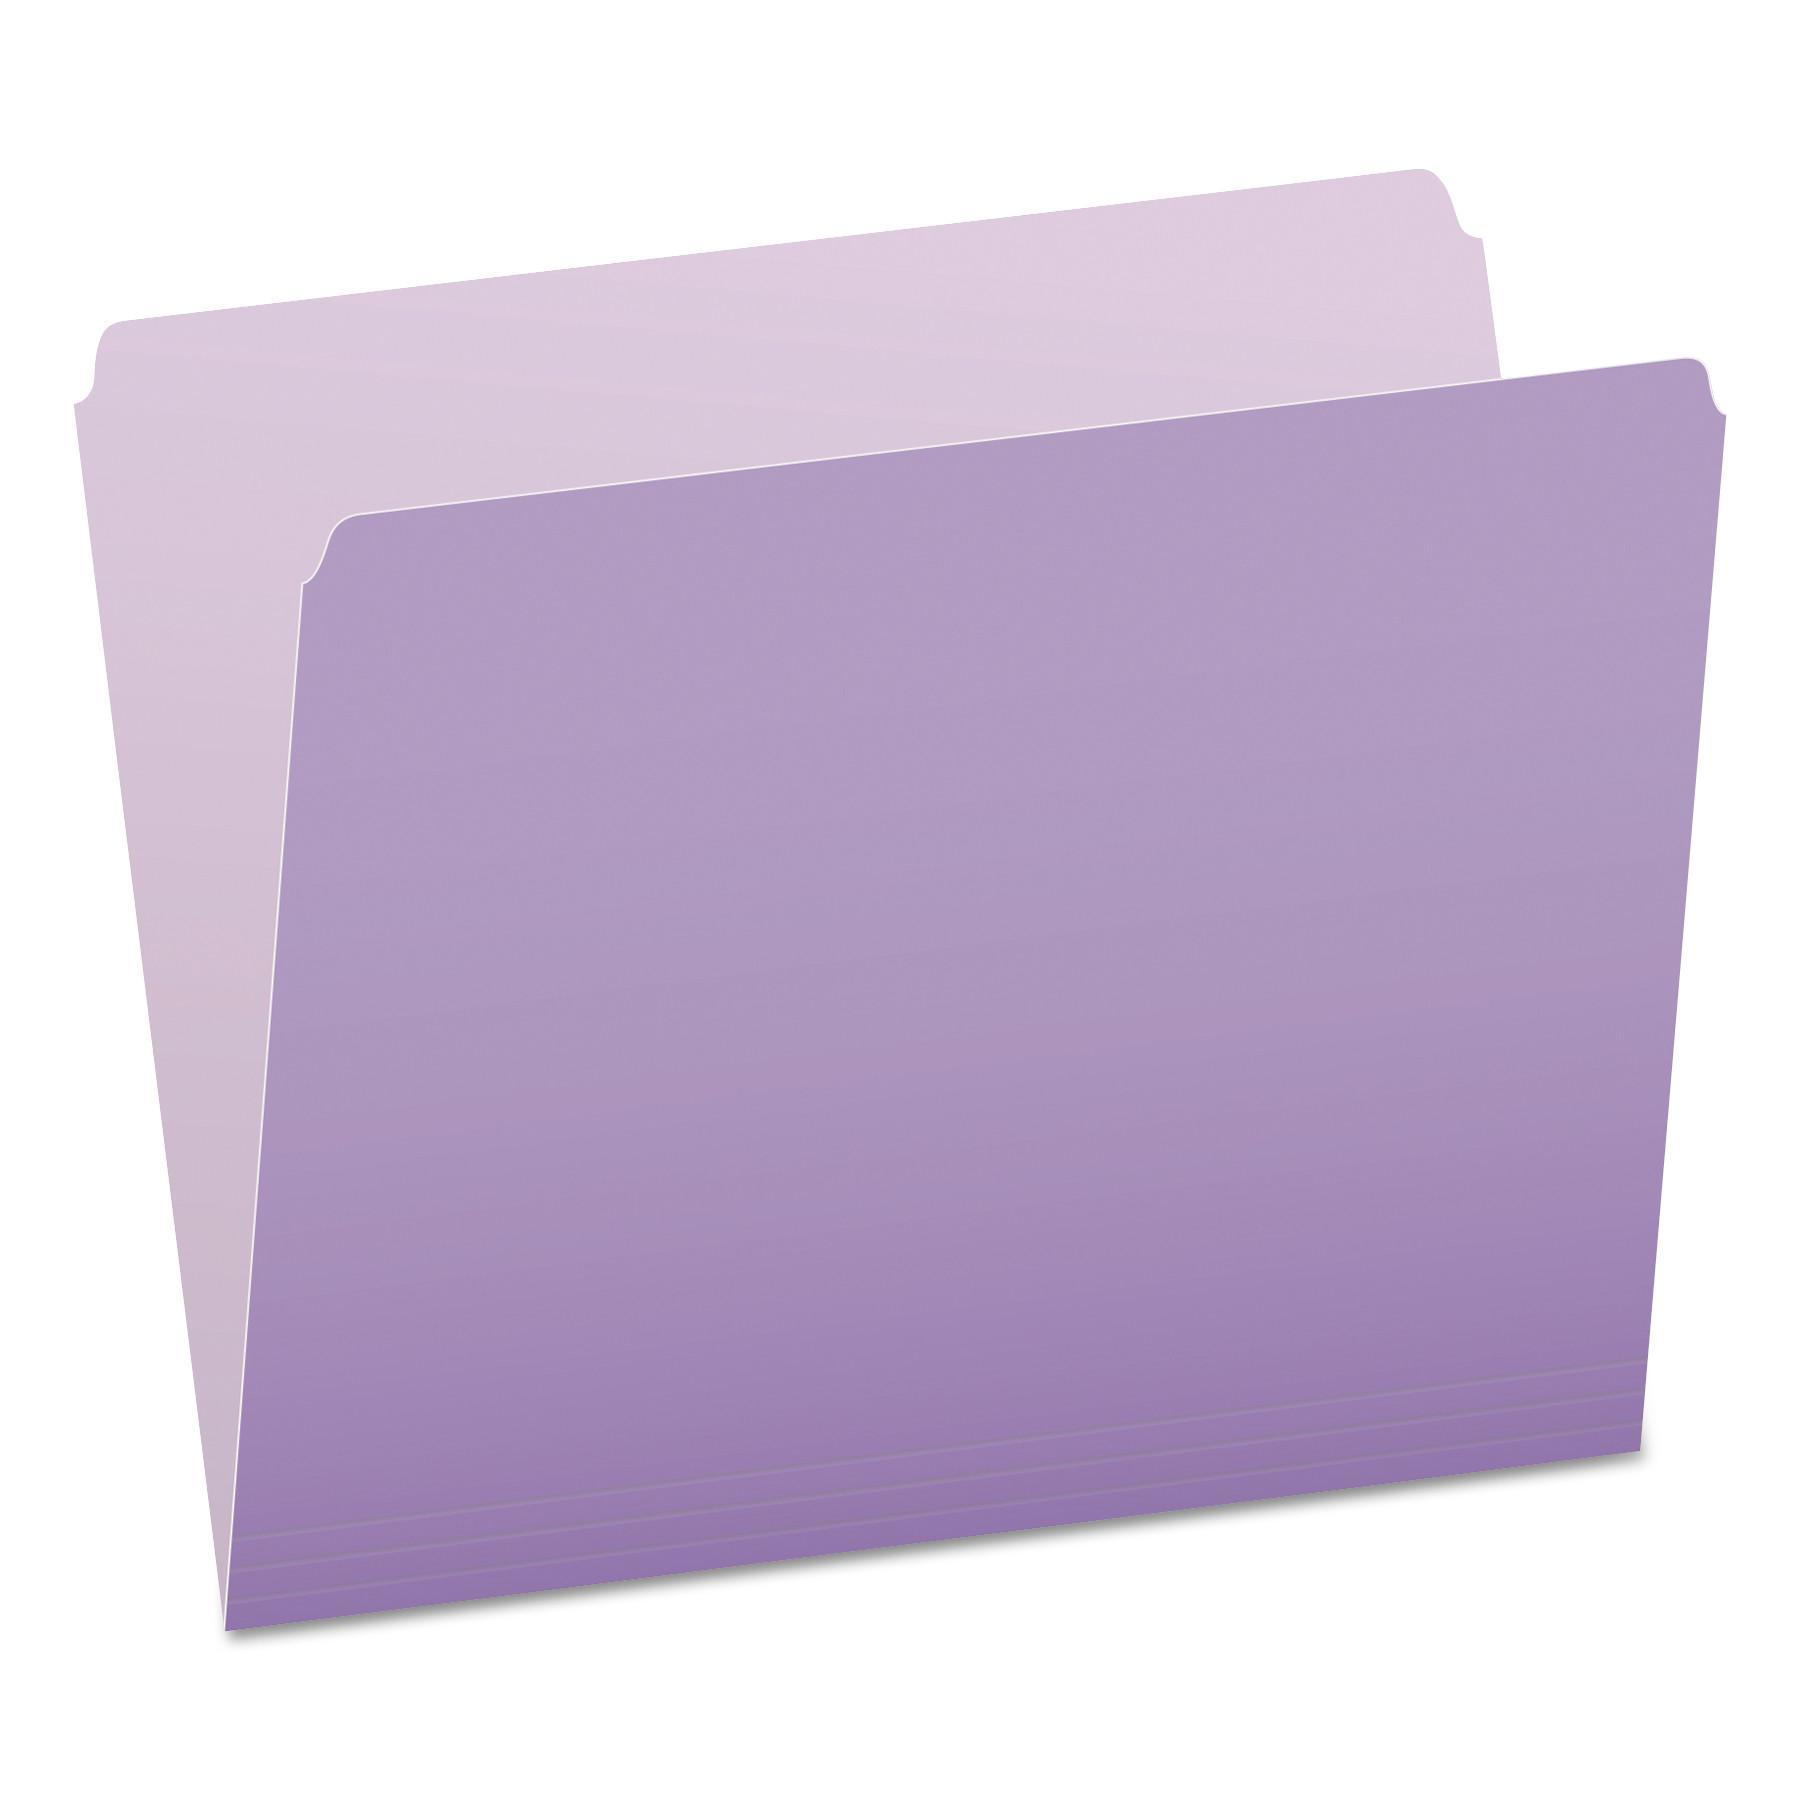 Pendaflex Colored File Folders 1//3 Cut Top Tab Letter Teal//Light Teal 100//Box